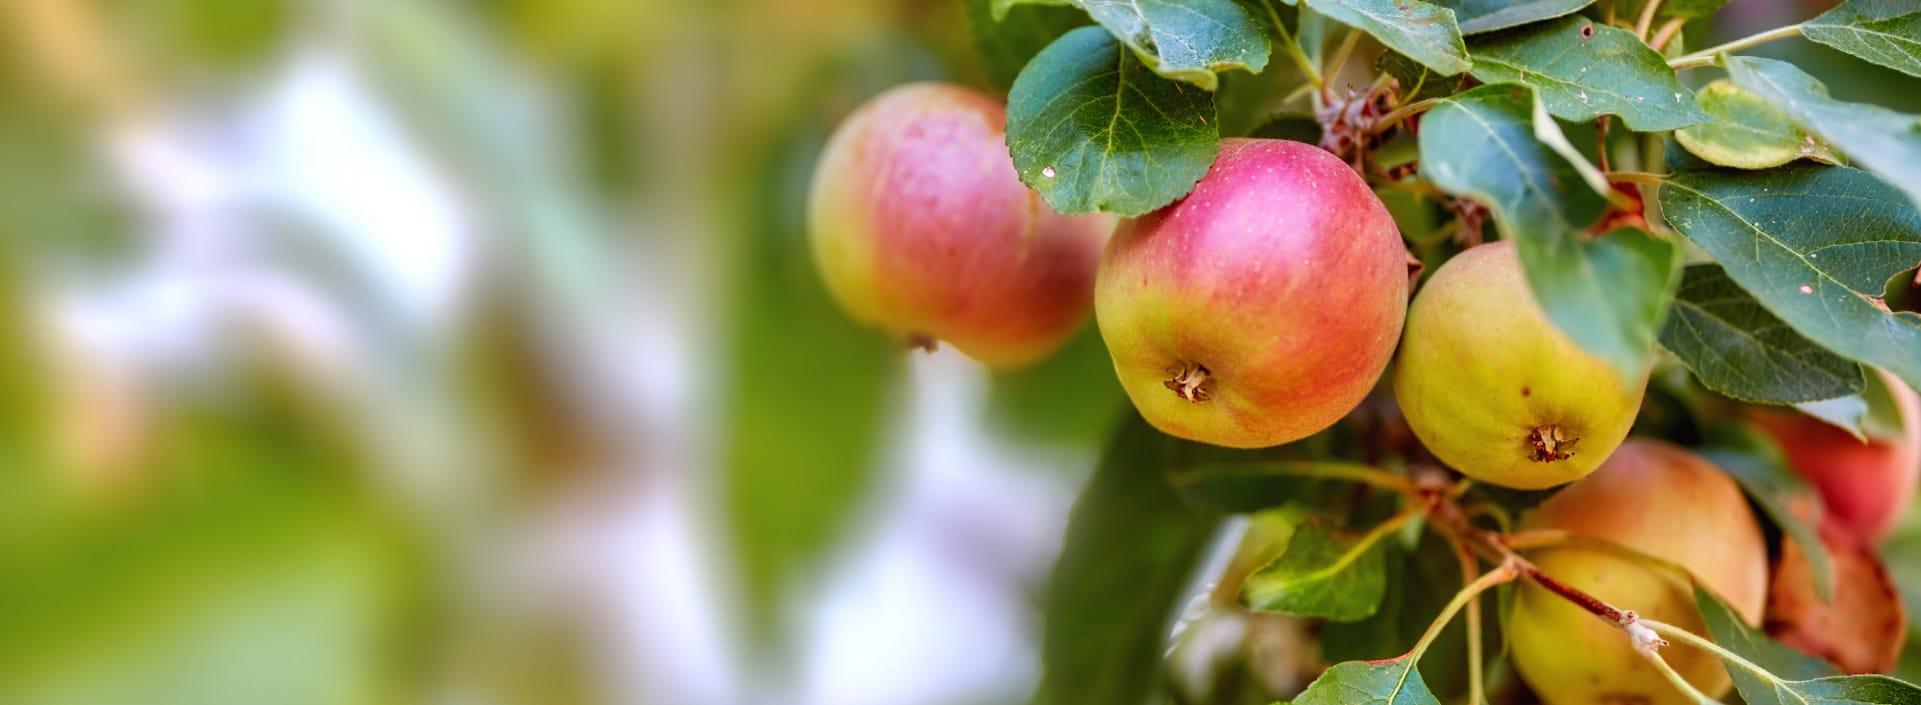 fresh apples in garden